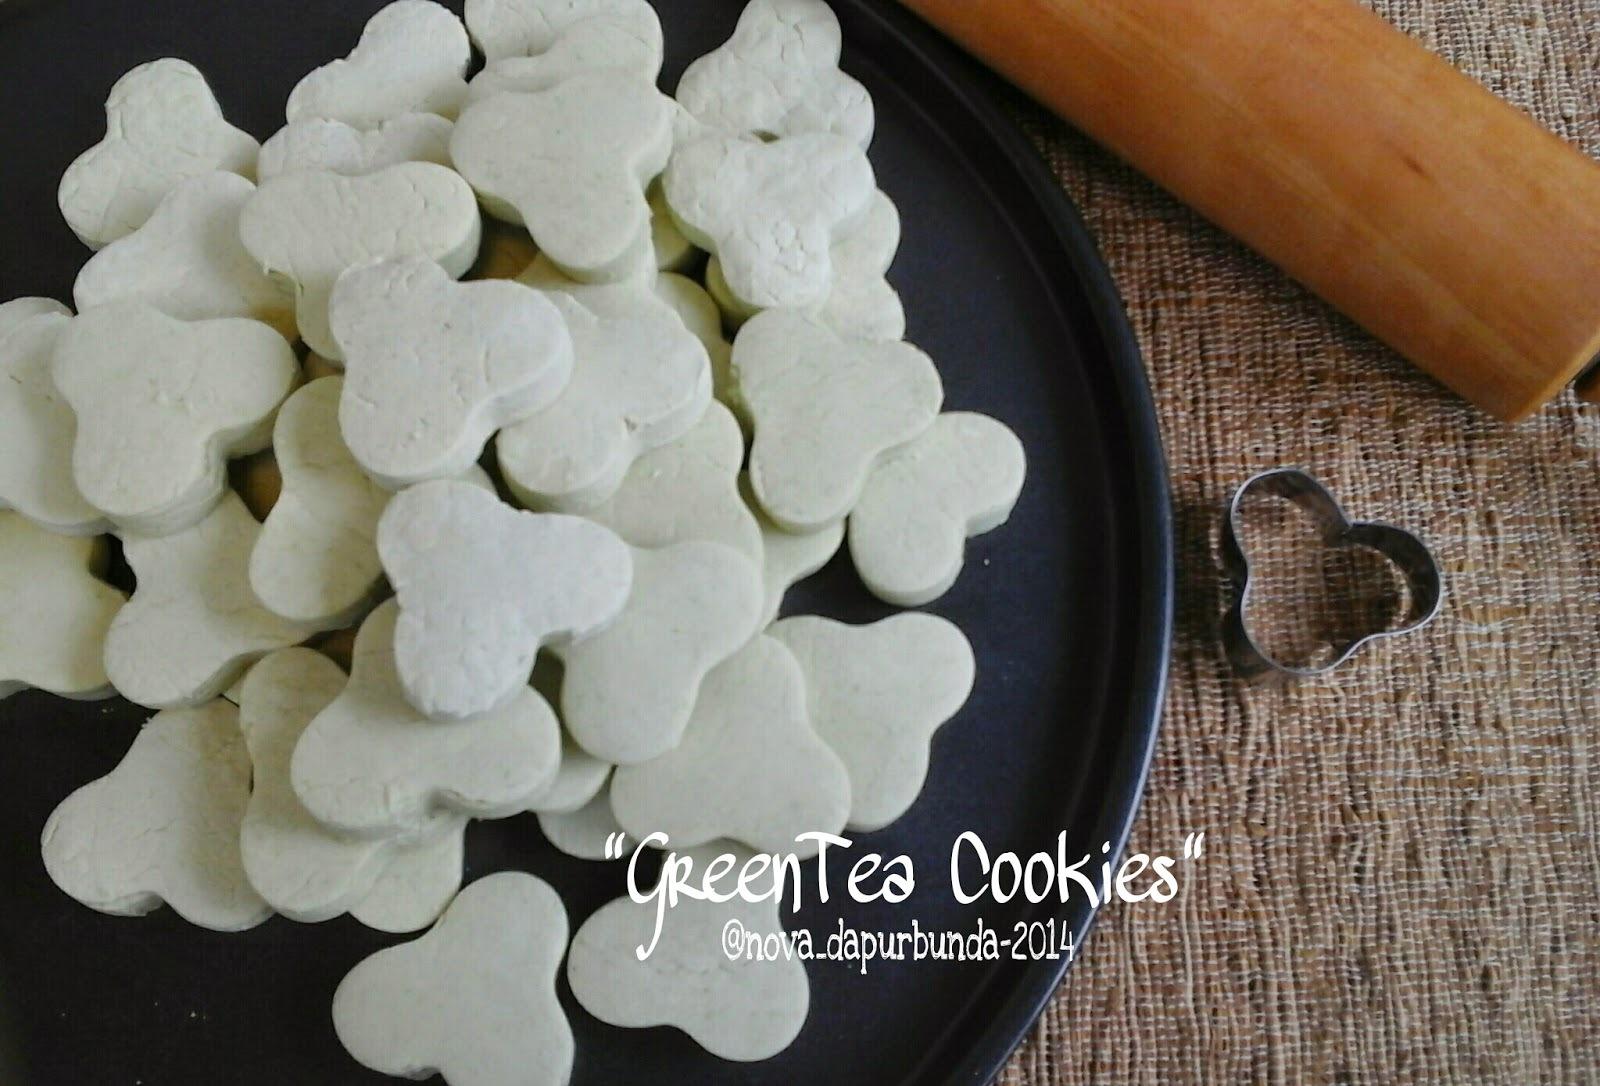 Green tea butter cookies recipes - myTaste.id